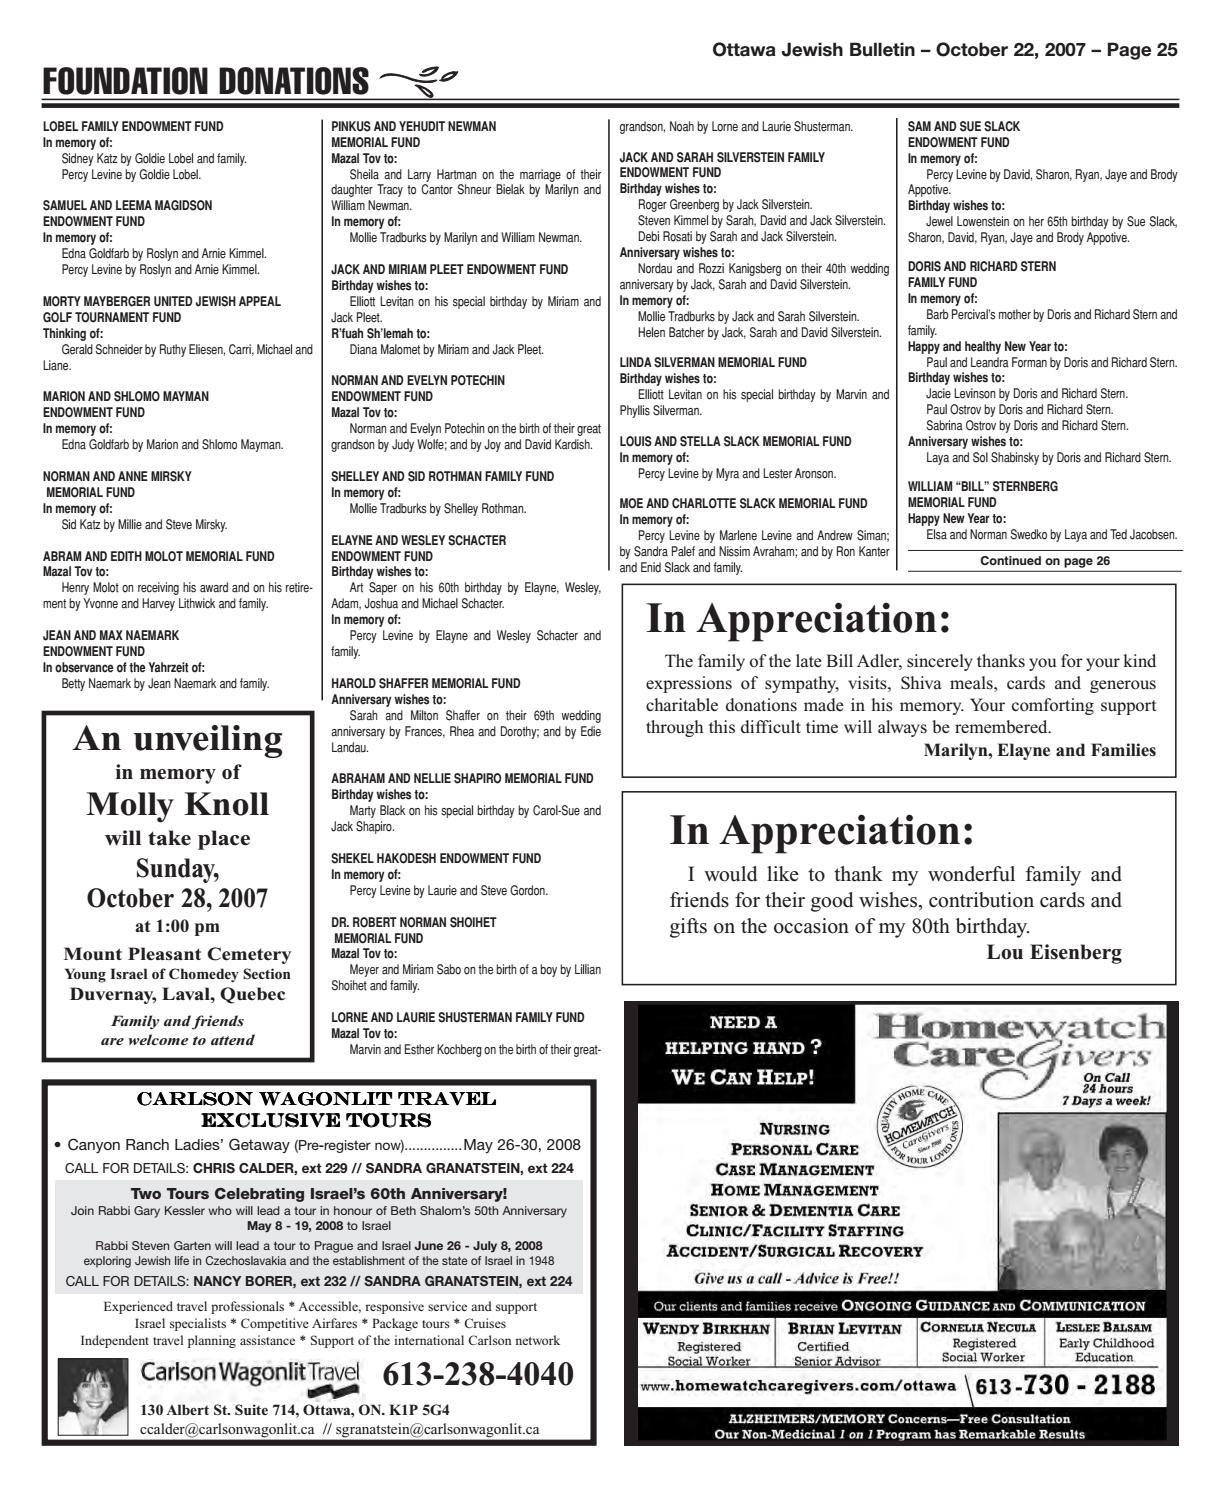 Ottawa Jewish Bulletin 2007 10 22inaccessible